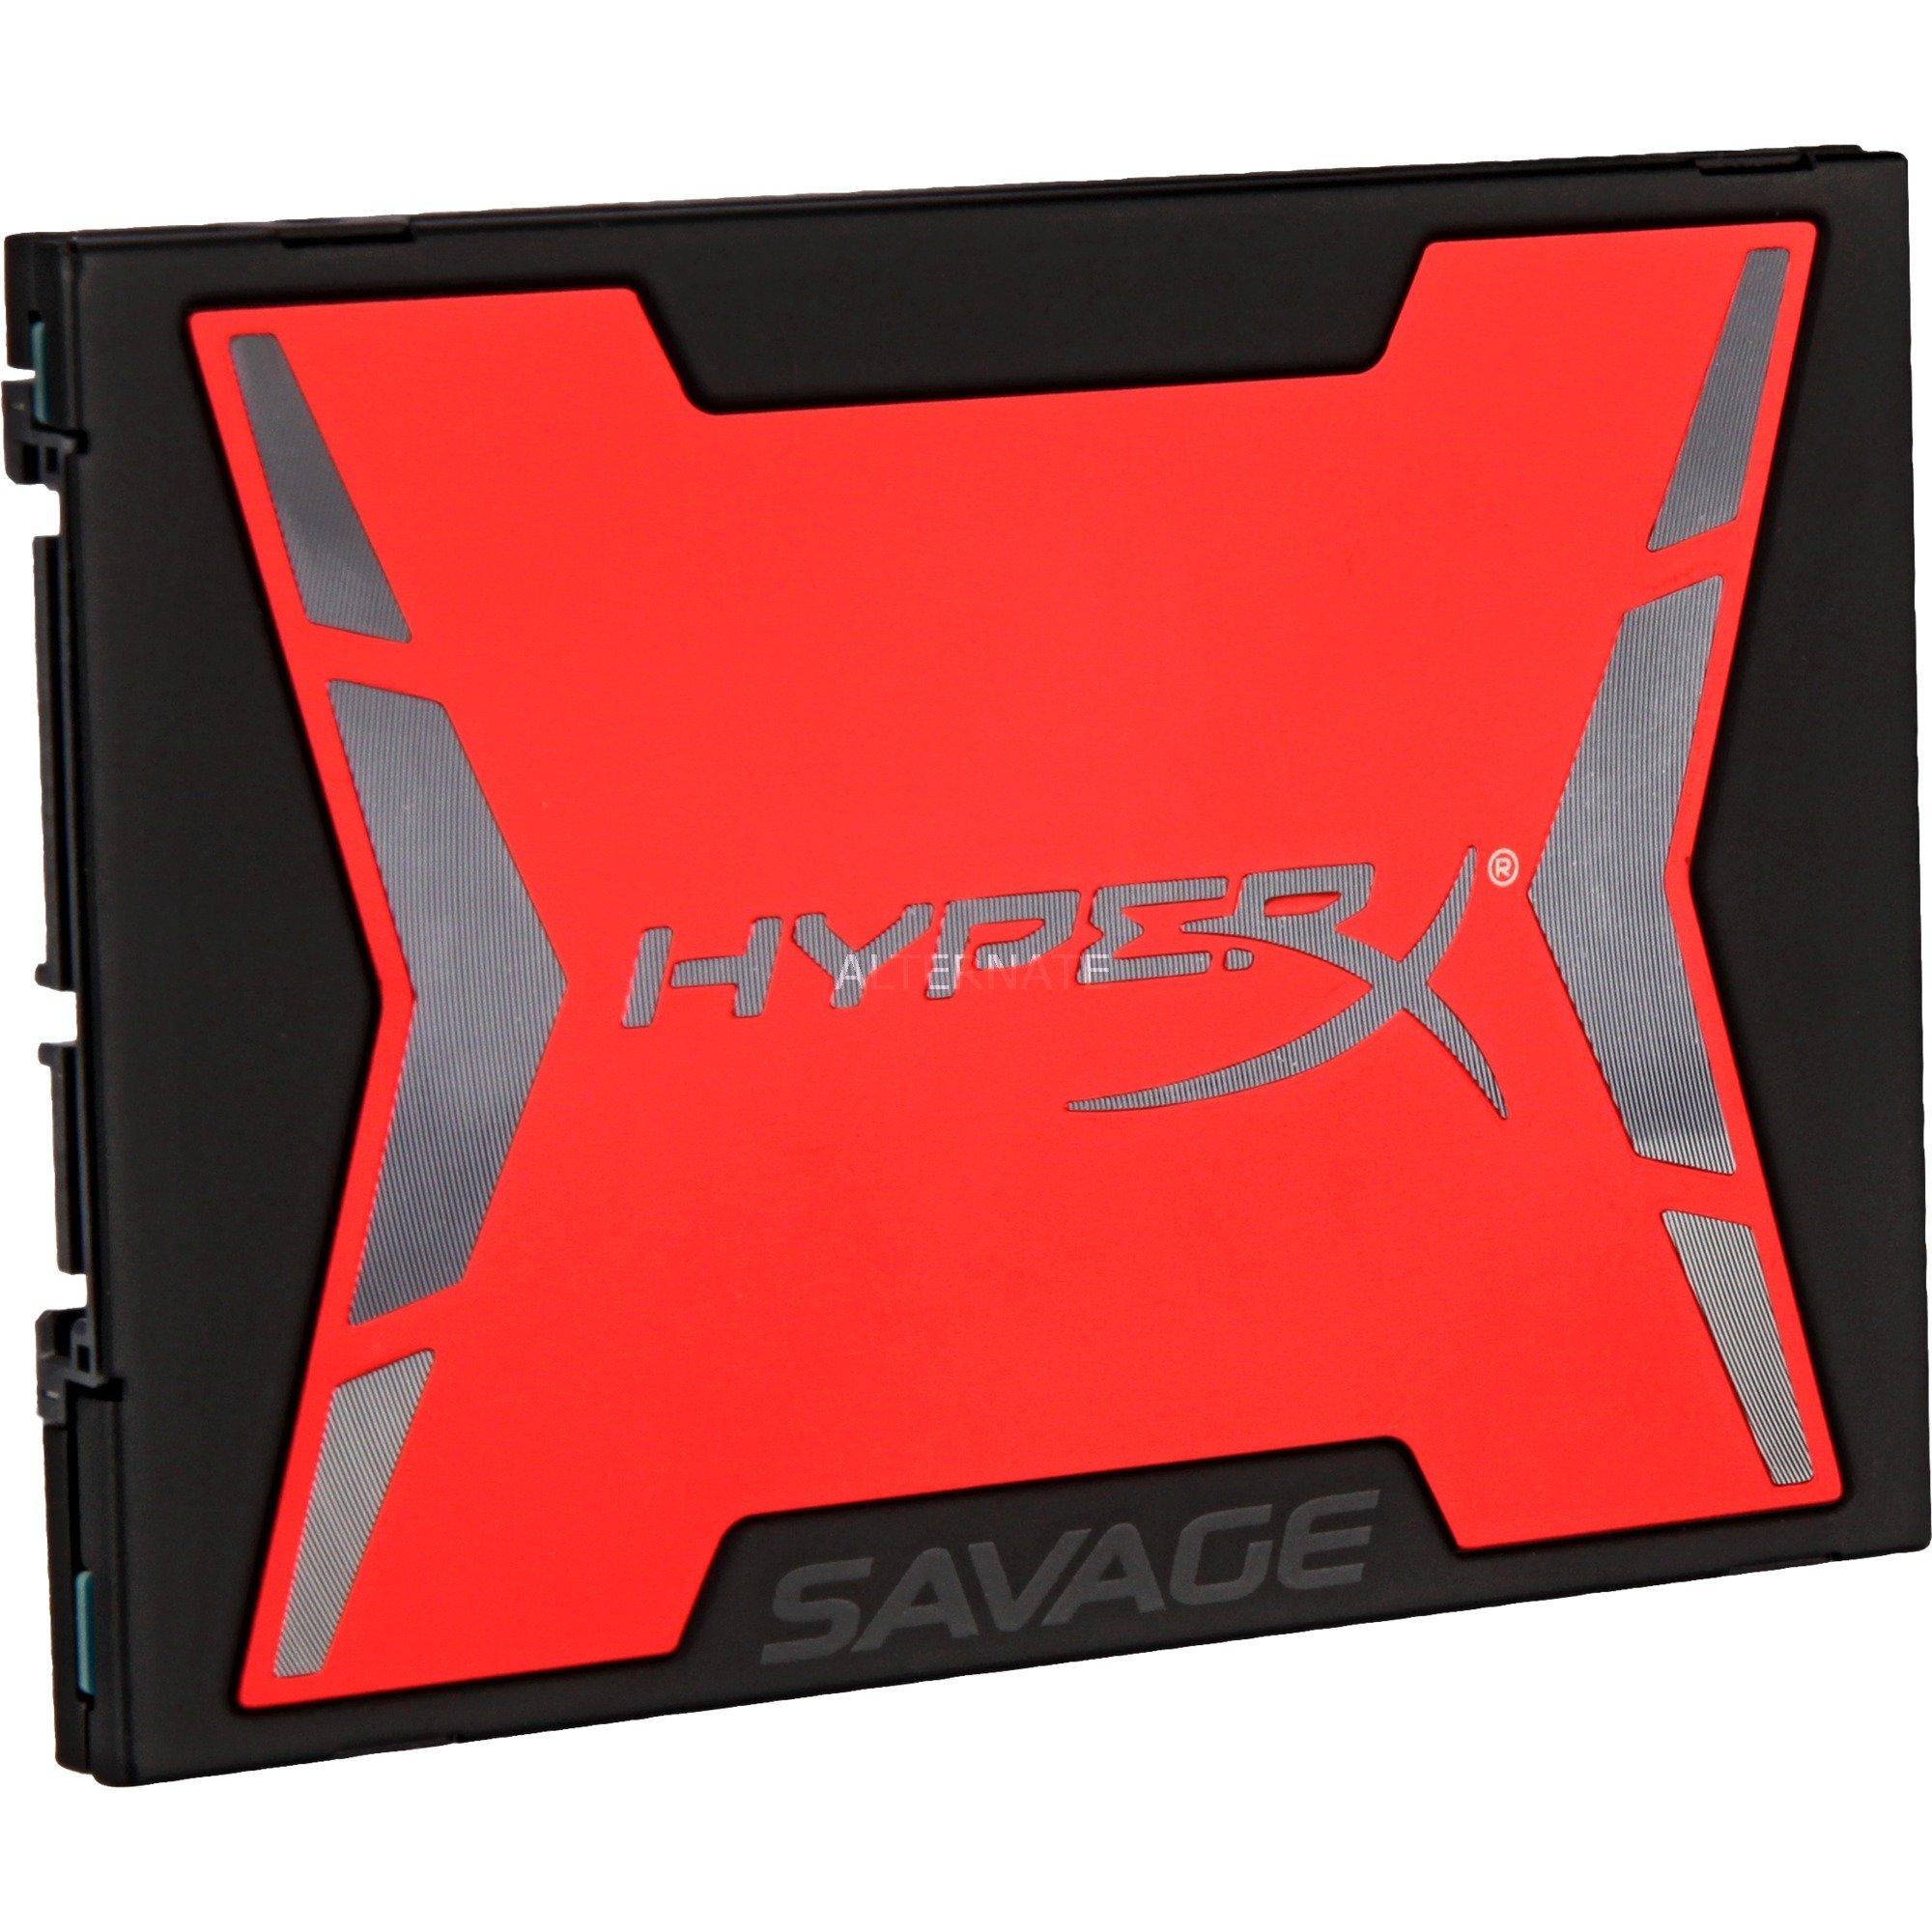 Kingston HyperX Savage 240GB Details